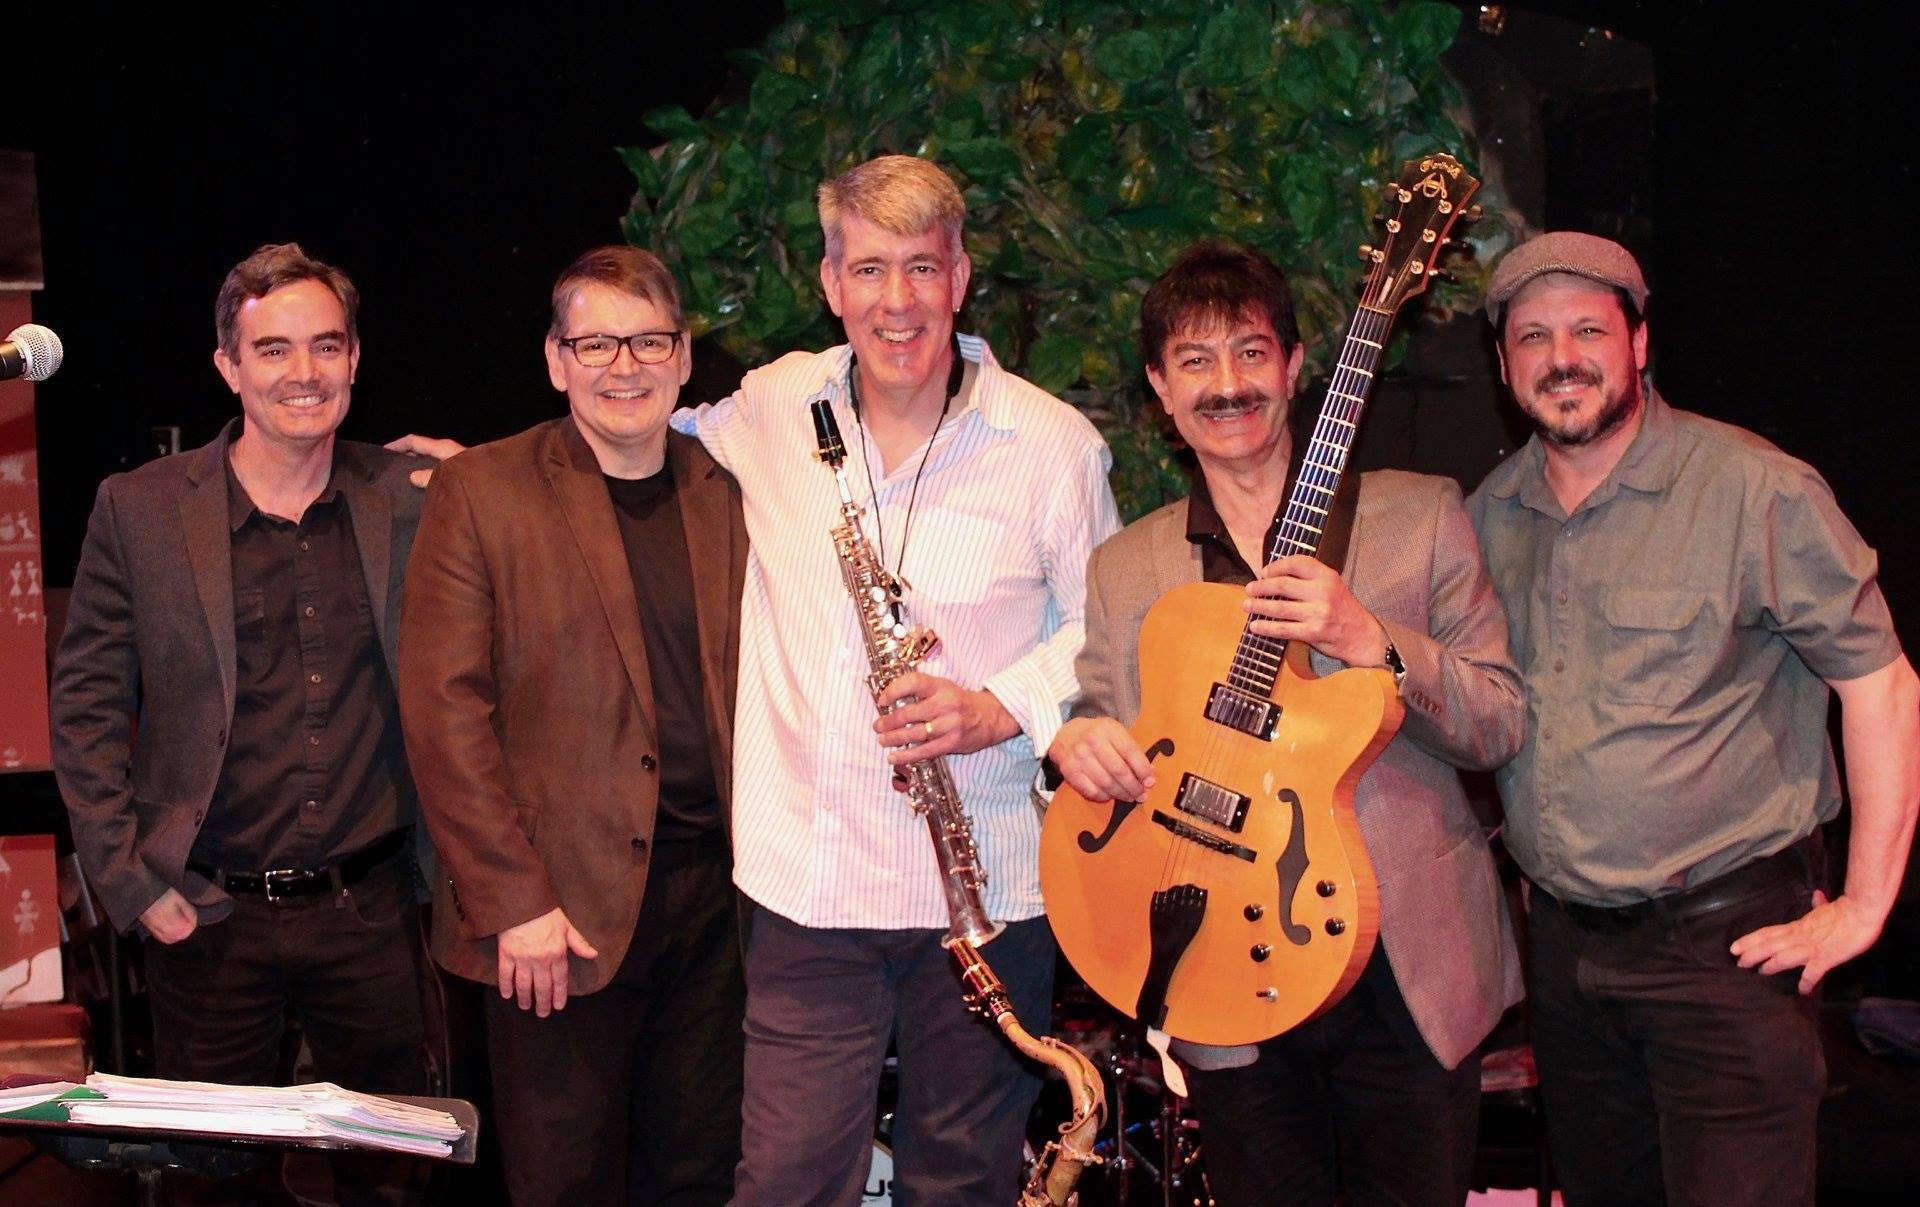 Daniel Ian Smith and The Latin Side of Billy Strayhorn Band. w/Fernando Huergo, Russell Hoffmann, Daniel Ian Smith, John Baboian, Steve Langone. photo by Cary Mulcahy